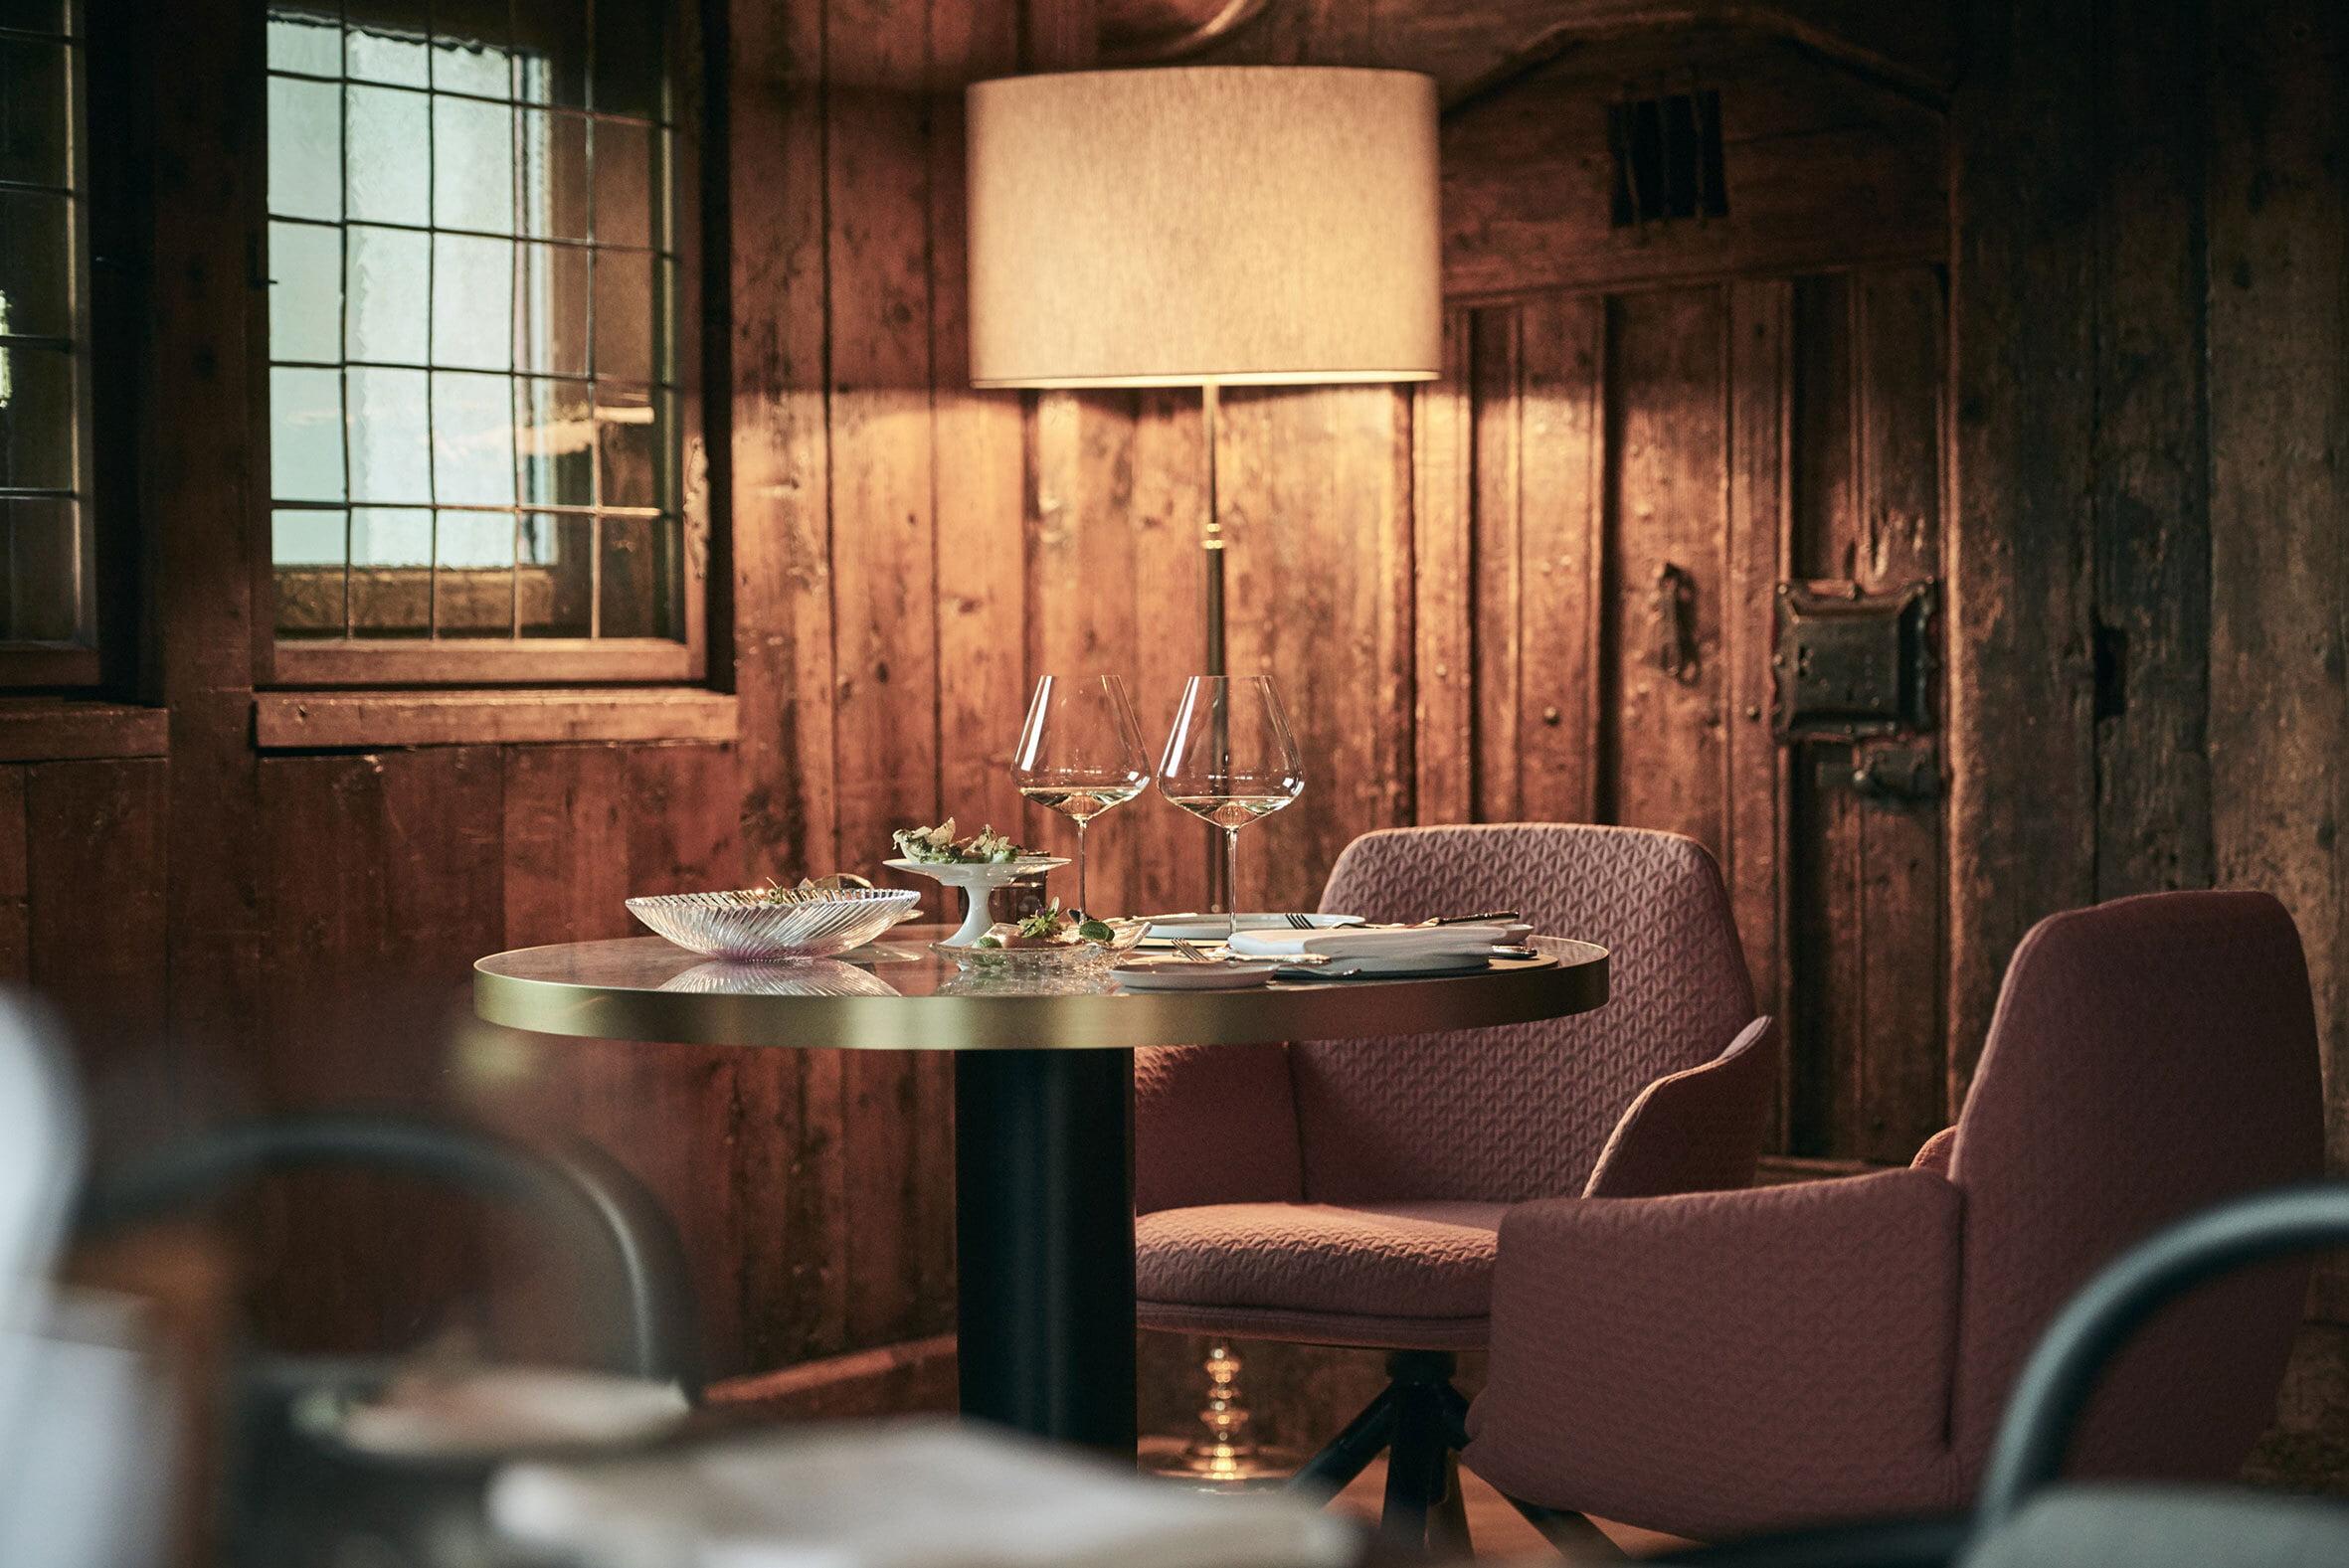 IGNIV by Andras Caminada St. Moritz Schweiz - Badrutt's Palace Hotel